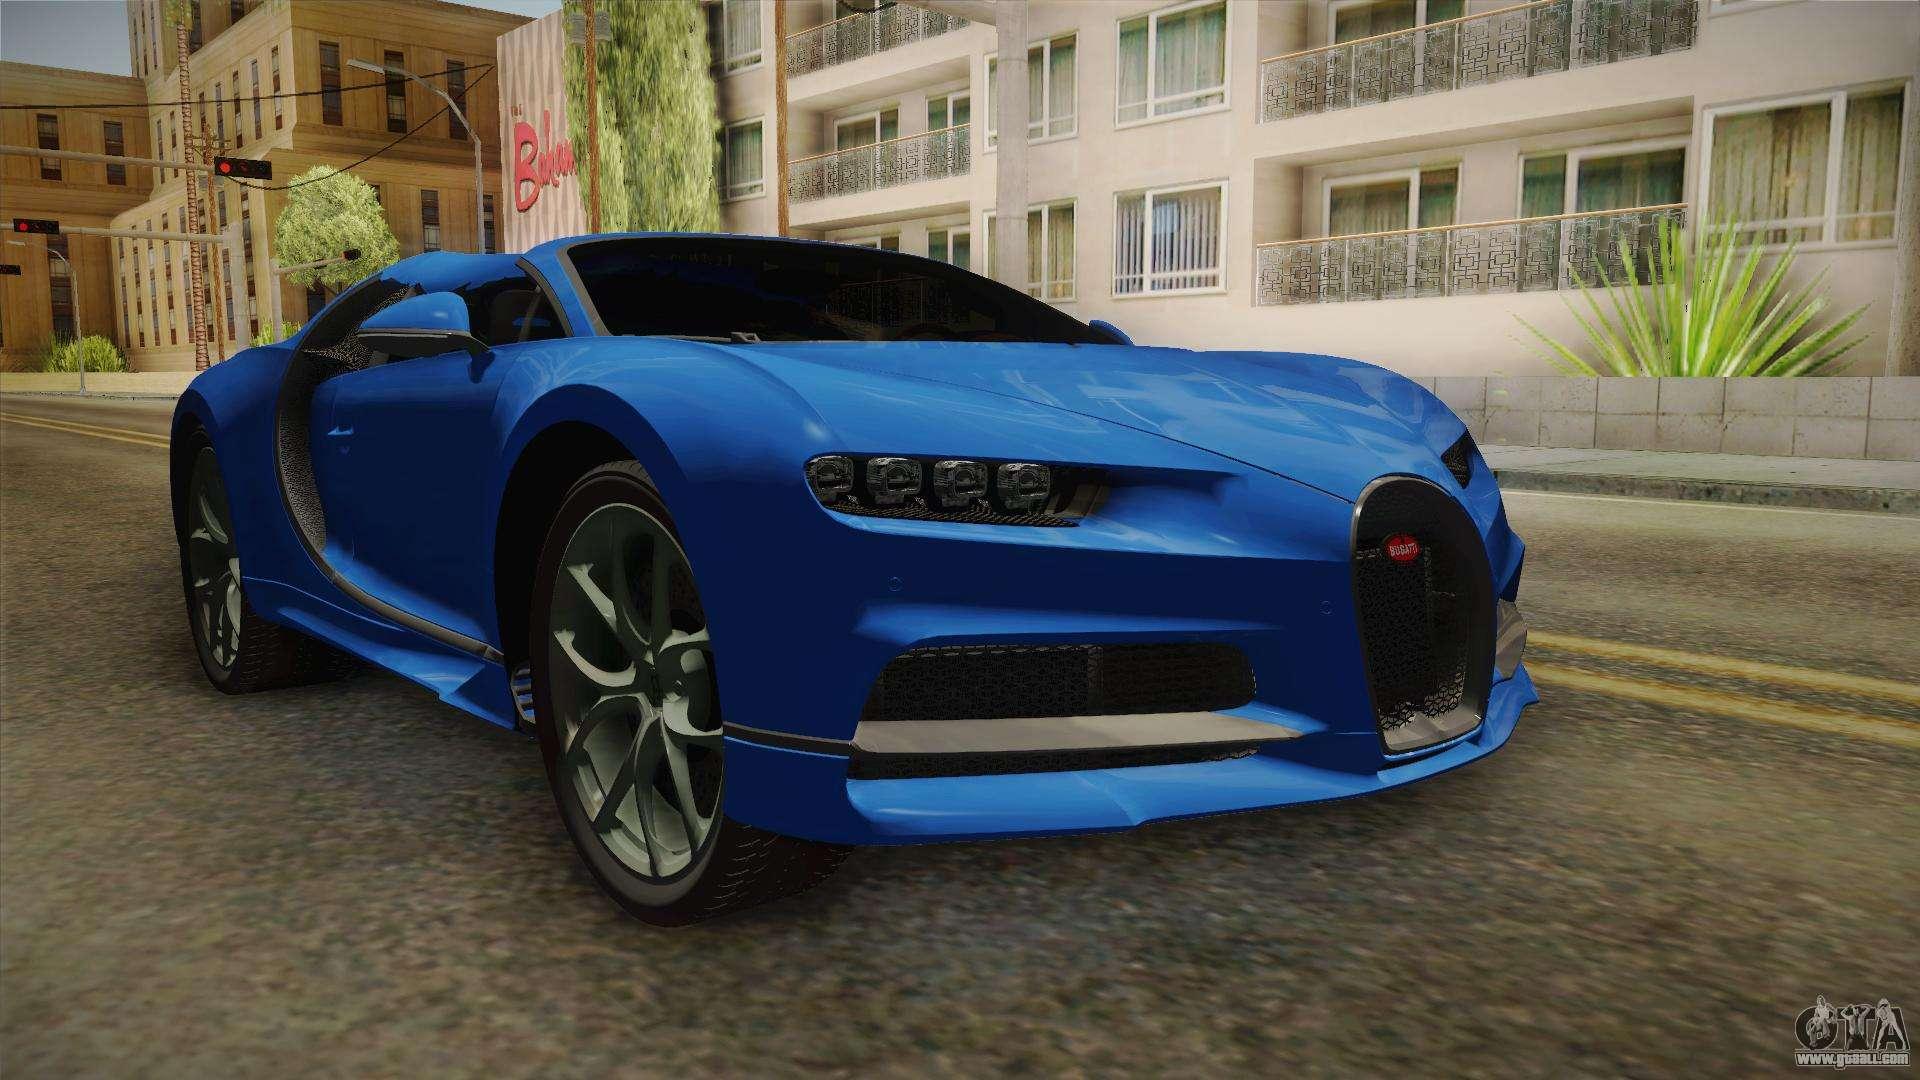 404202-gta-sa-2017-06-02-18-07-00-85 Terrific Bugatti Veyron Mod Gta Sa Cars Trend